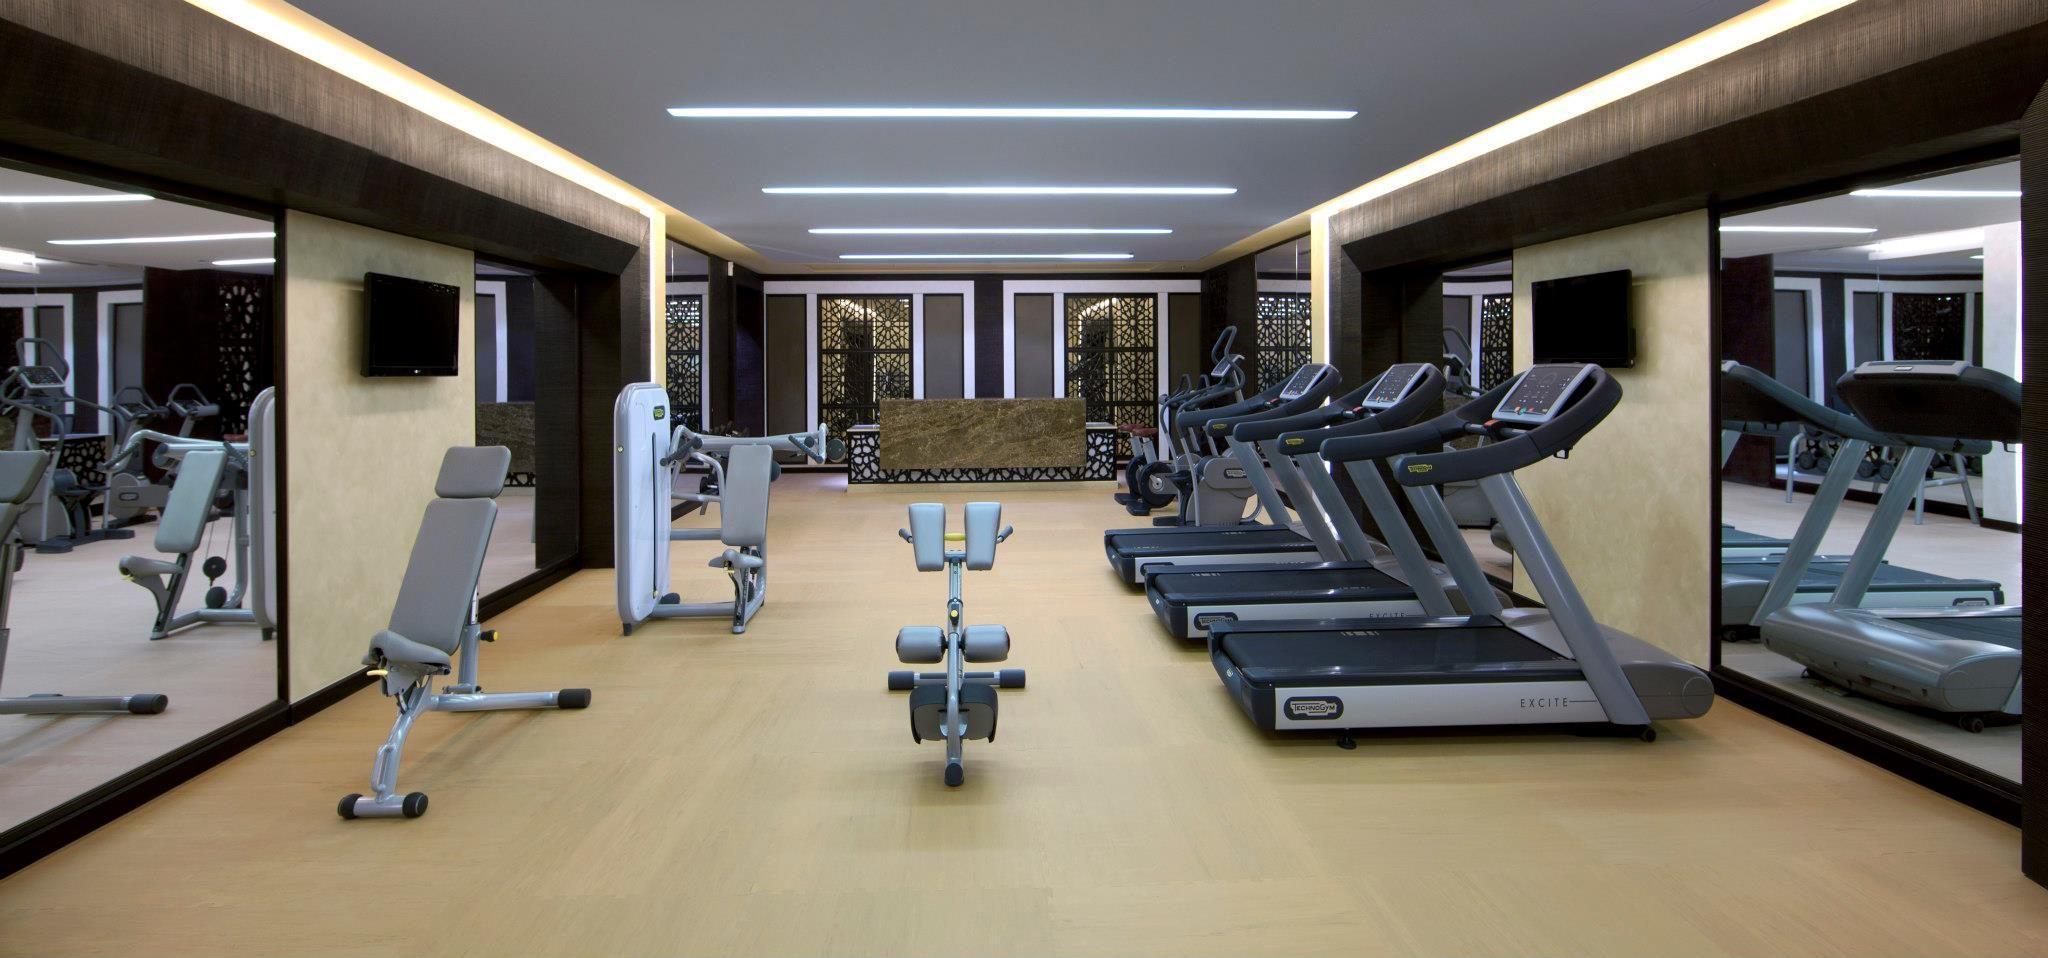 Gym at the al mirqab boutique hotel souq waqif doha qatar